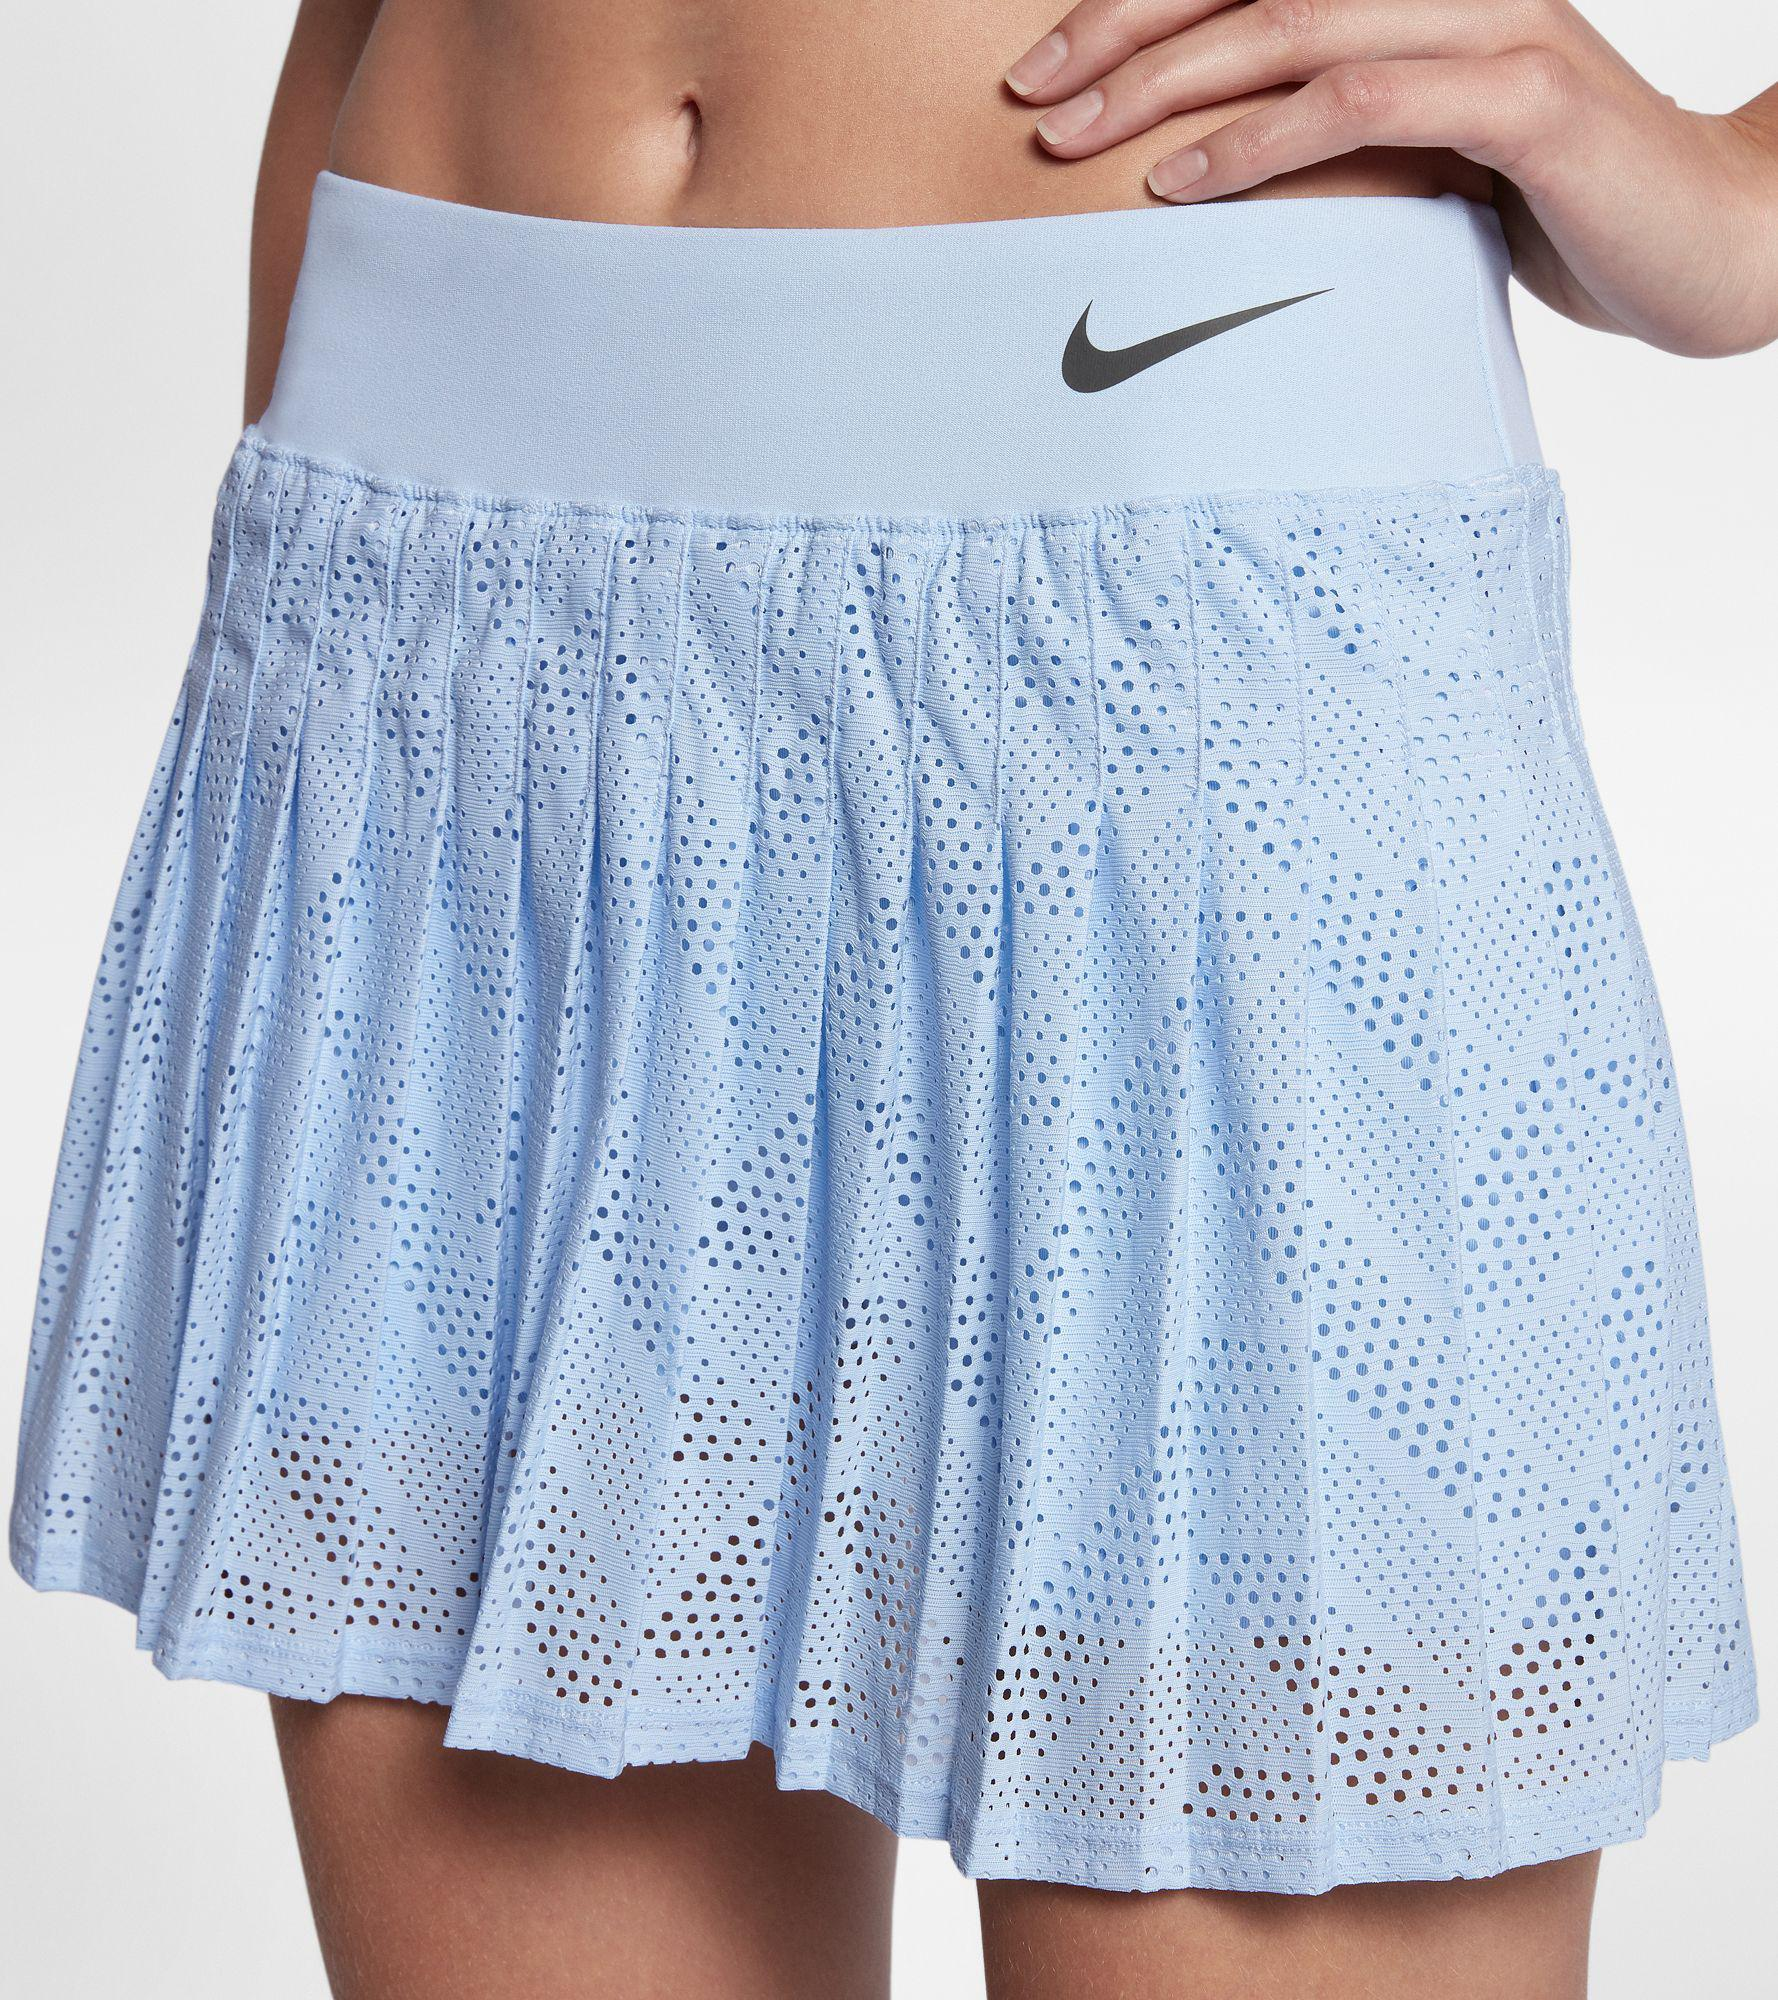 Nike. Women's Blue Maria Premier Tennis Skirt